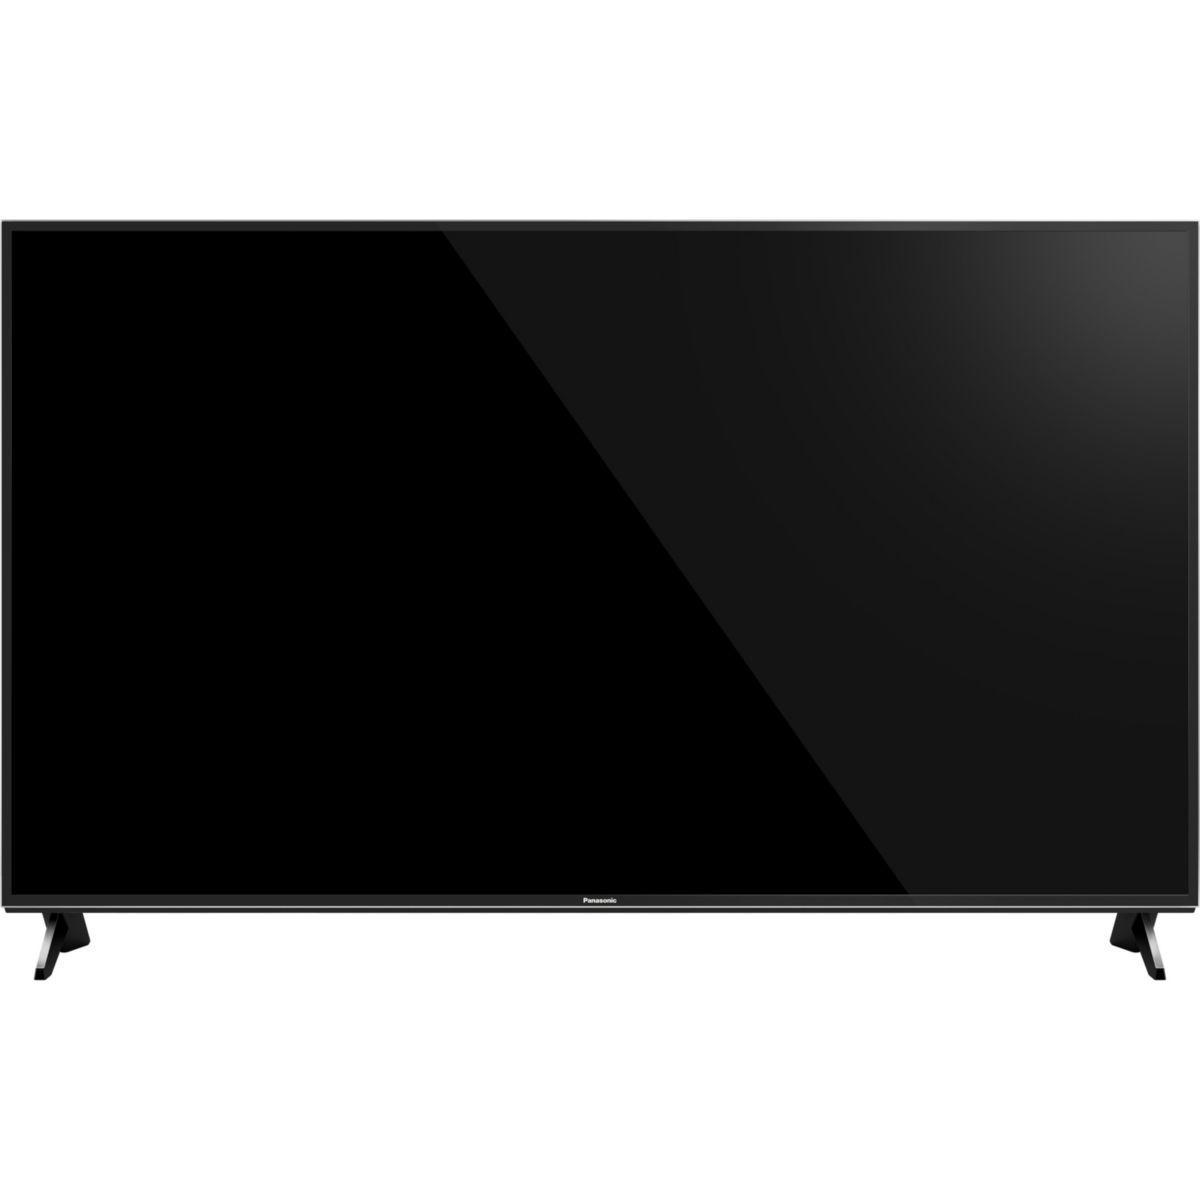 Tv led panasonic tx-65fx600e - 7% de remise imm�diate avec le code : fete7